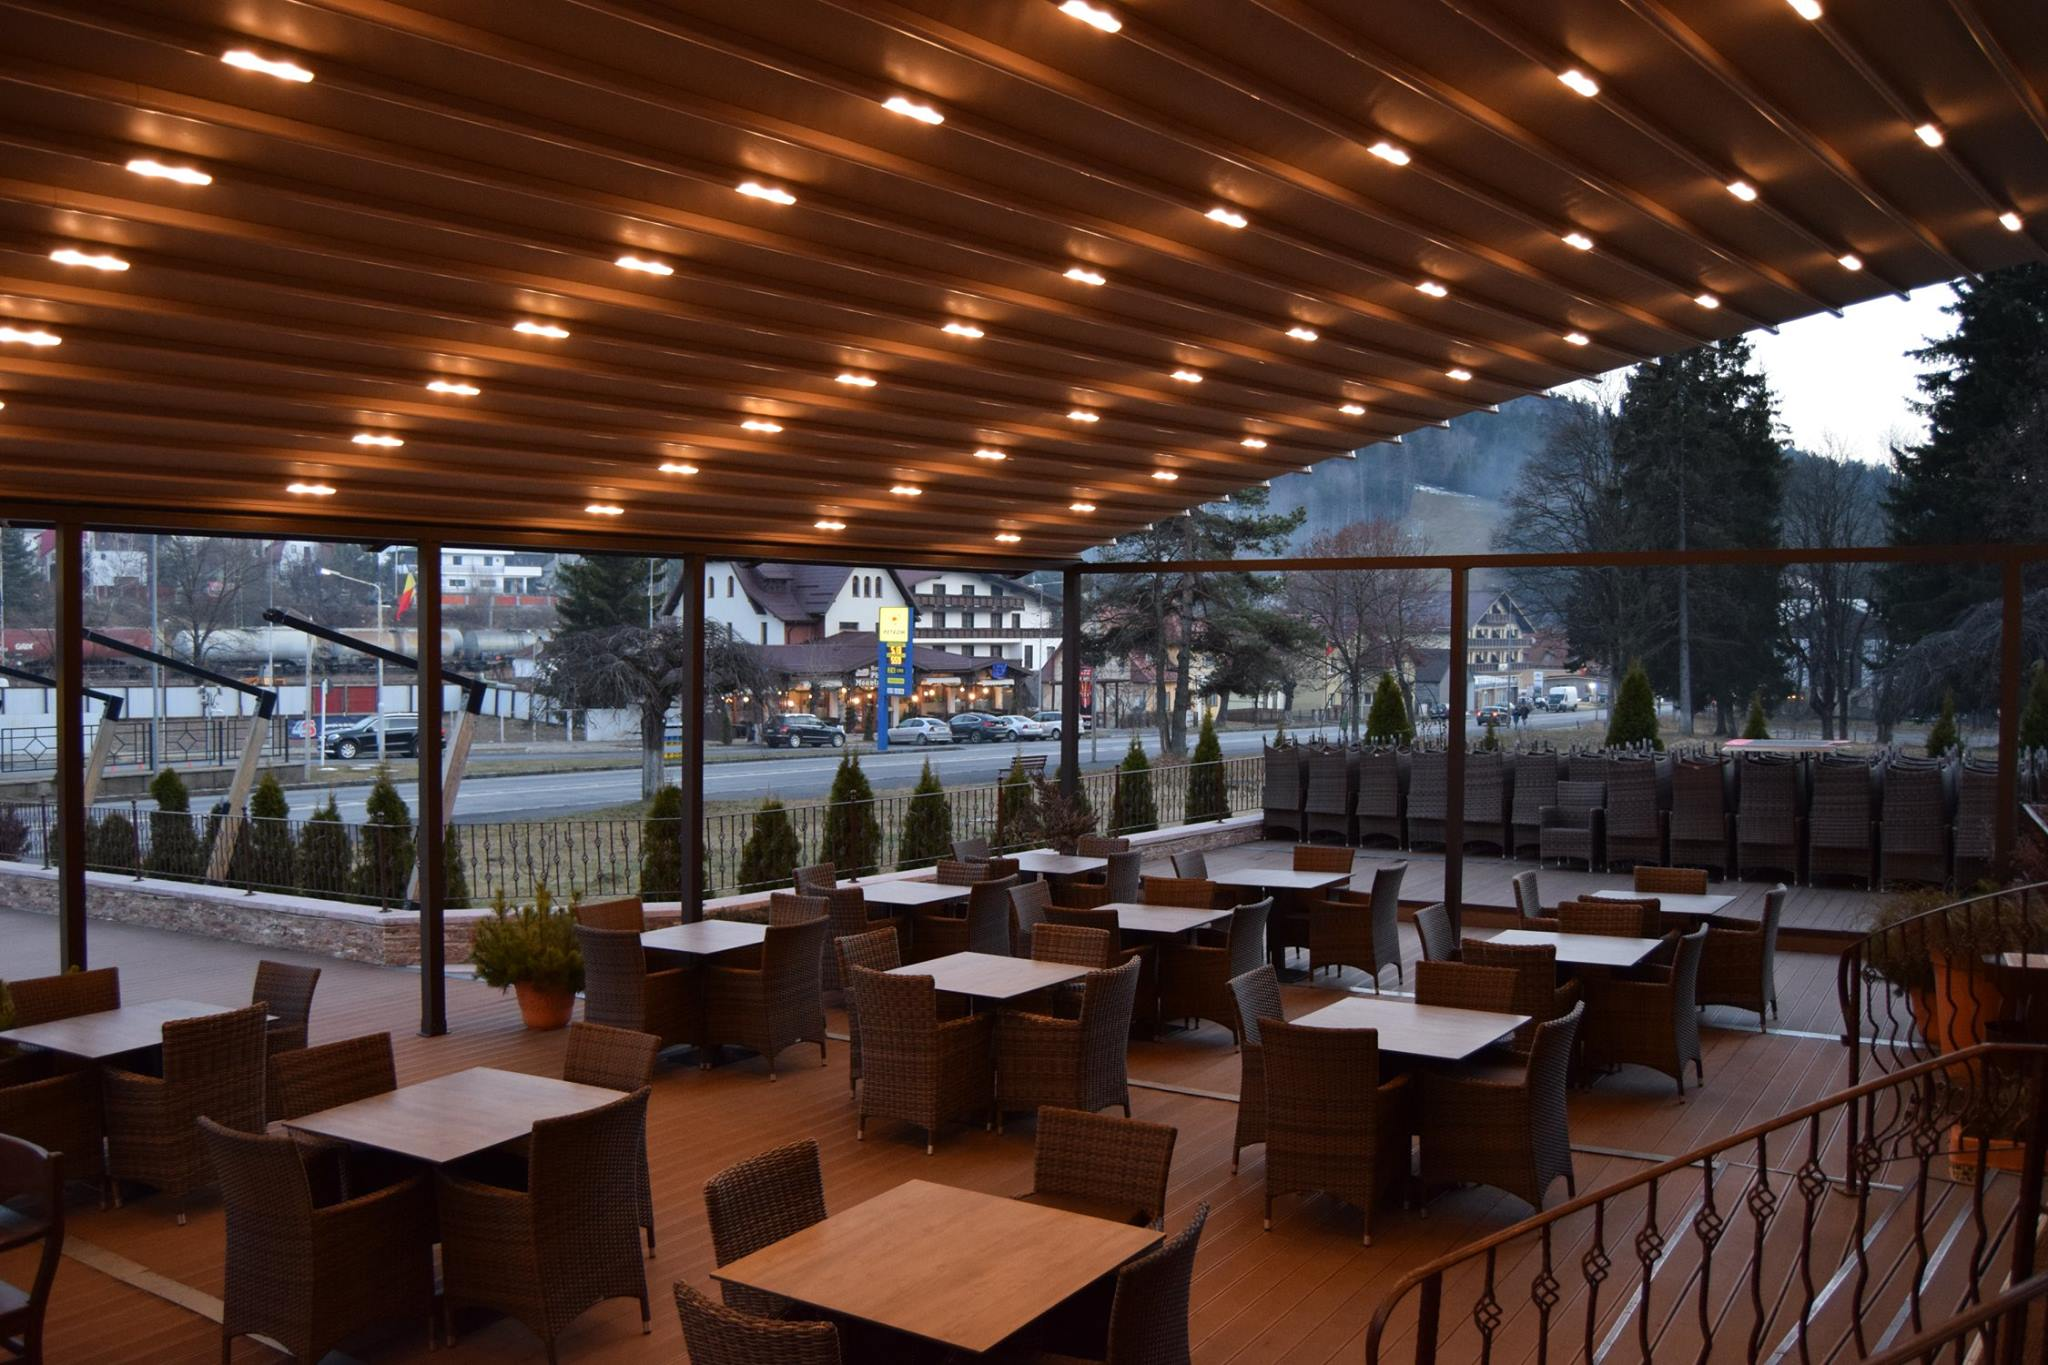 Pergola Cu Acoperis Retractabil Spline Pergole Elegante Pentru Terase De Restaurant Sun Leader Bestimo Ro